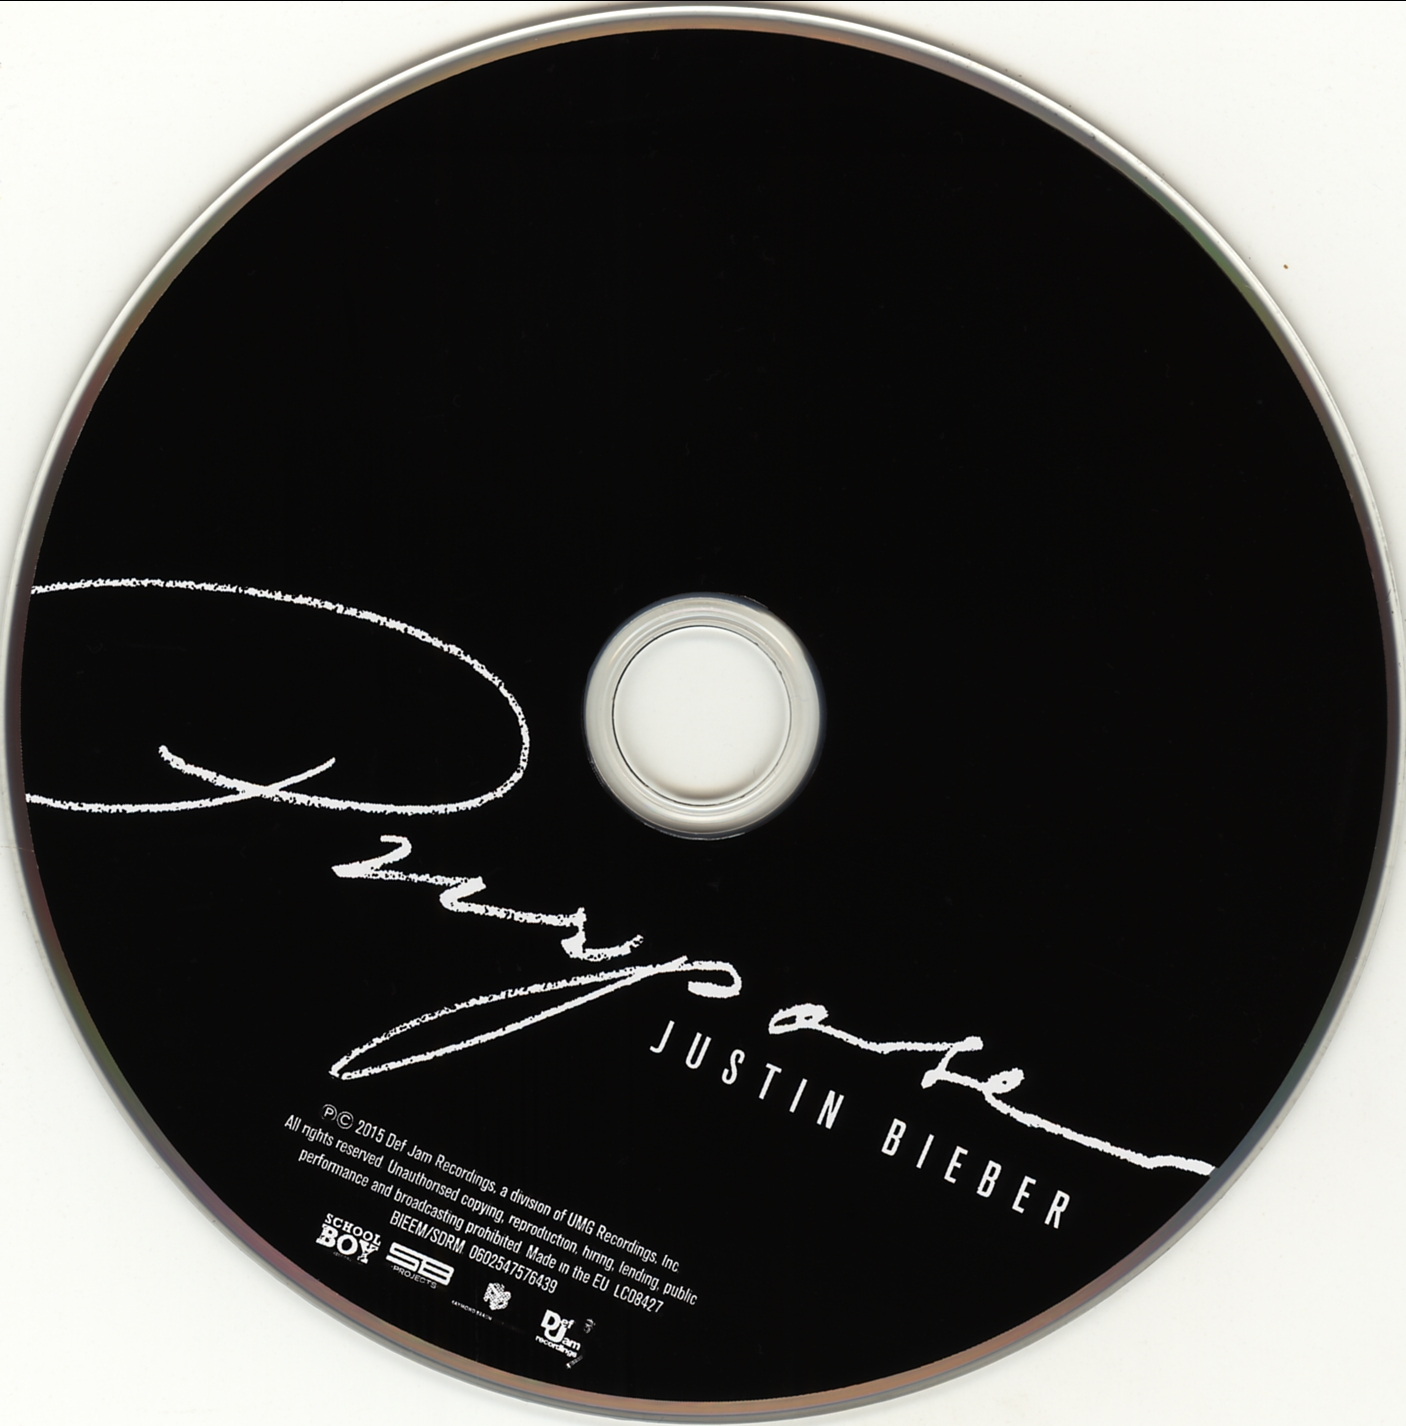 Image Purpose Cd Deluxe Jpg Justin Bieber Wiki